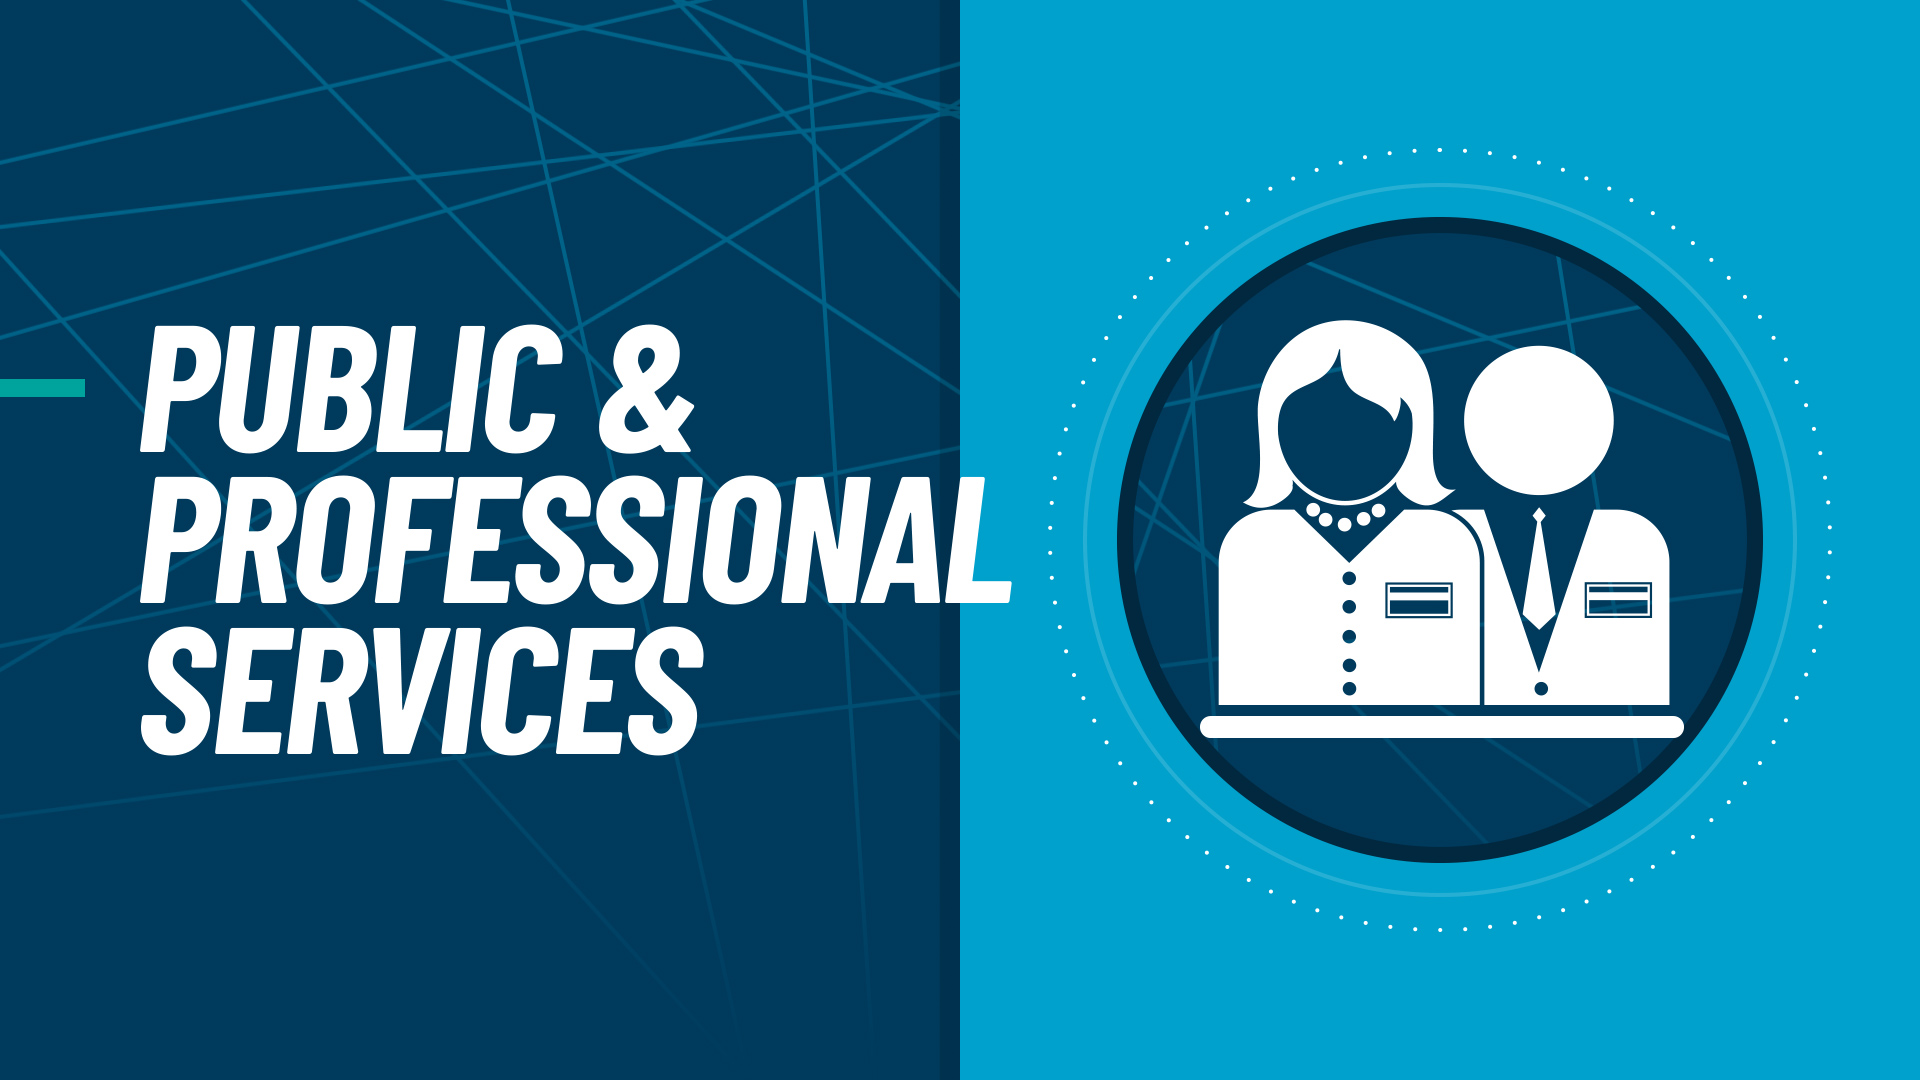 Public & Professional Services Career Pathway | TCC Service